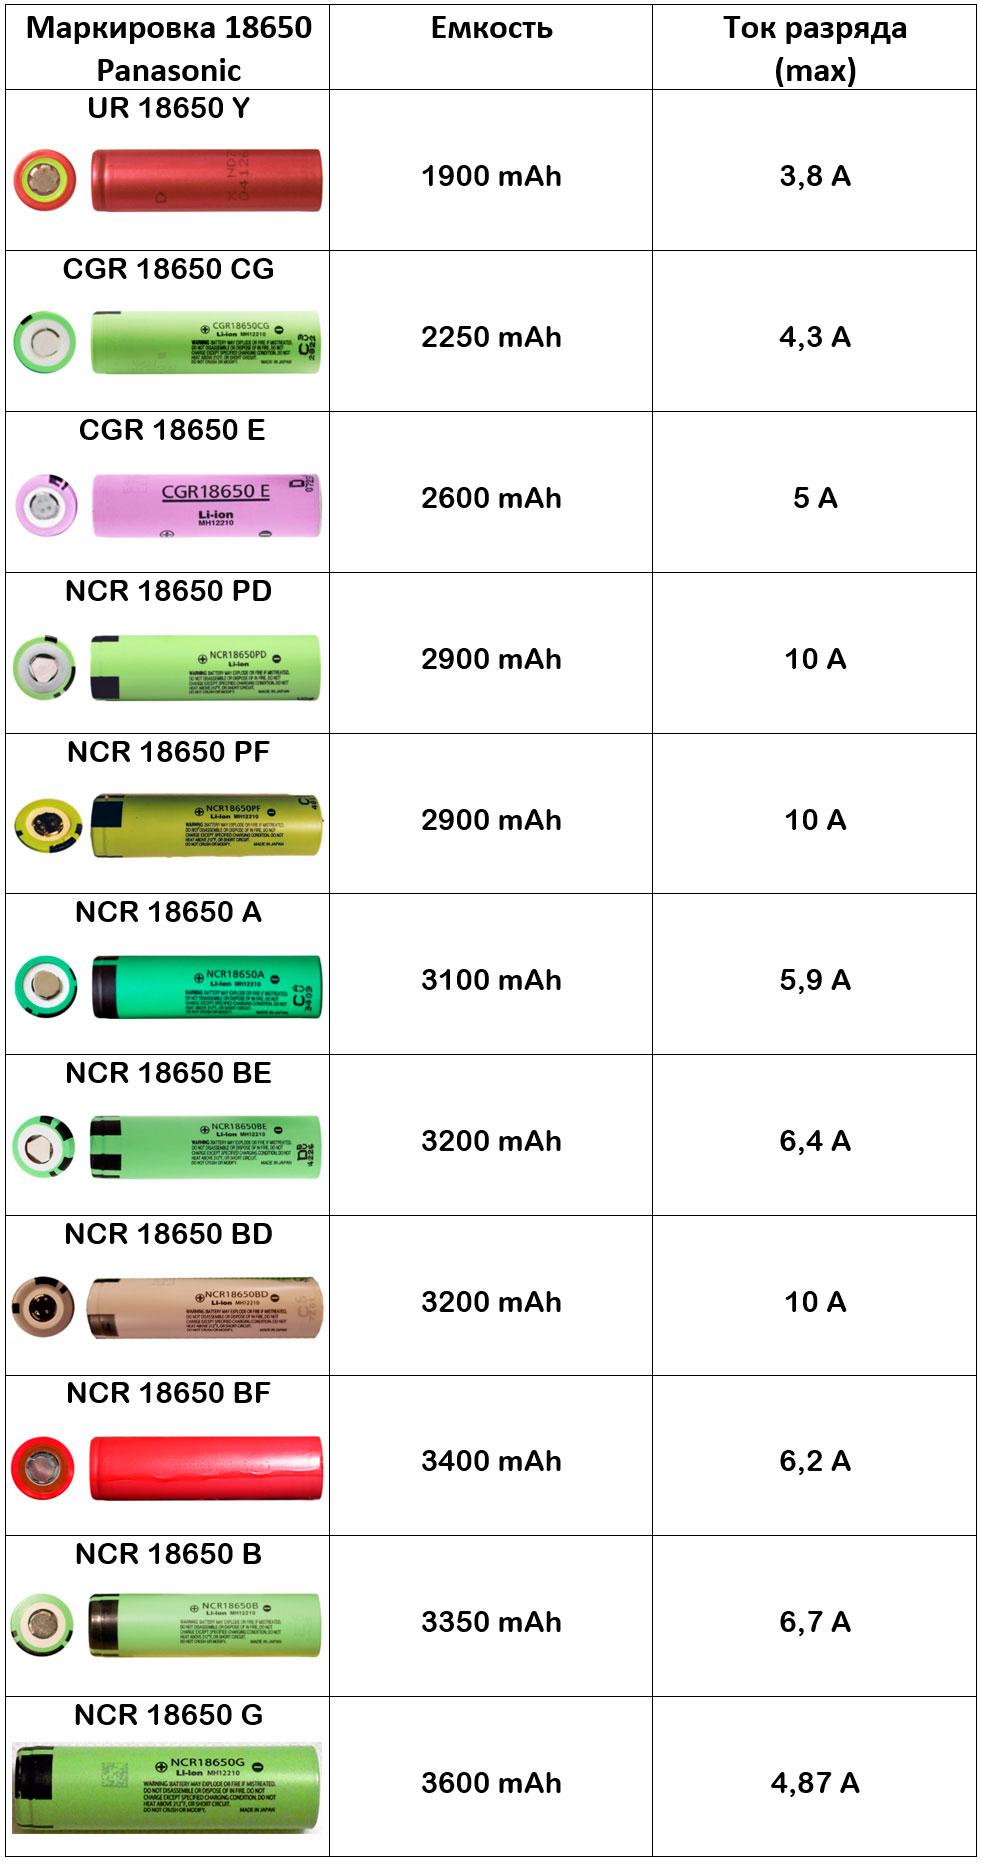 таблица характеристик по аккумуляторам 18650 Panasonic максимальный ток и емкость